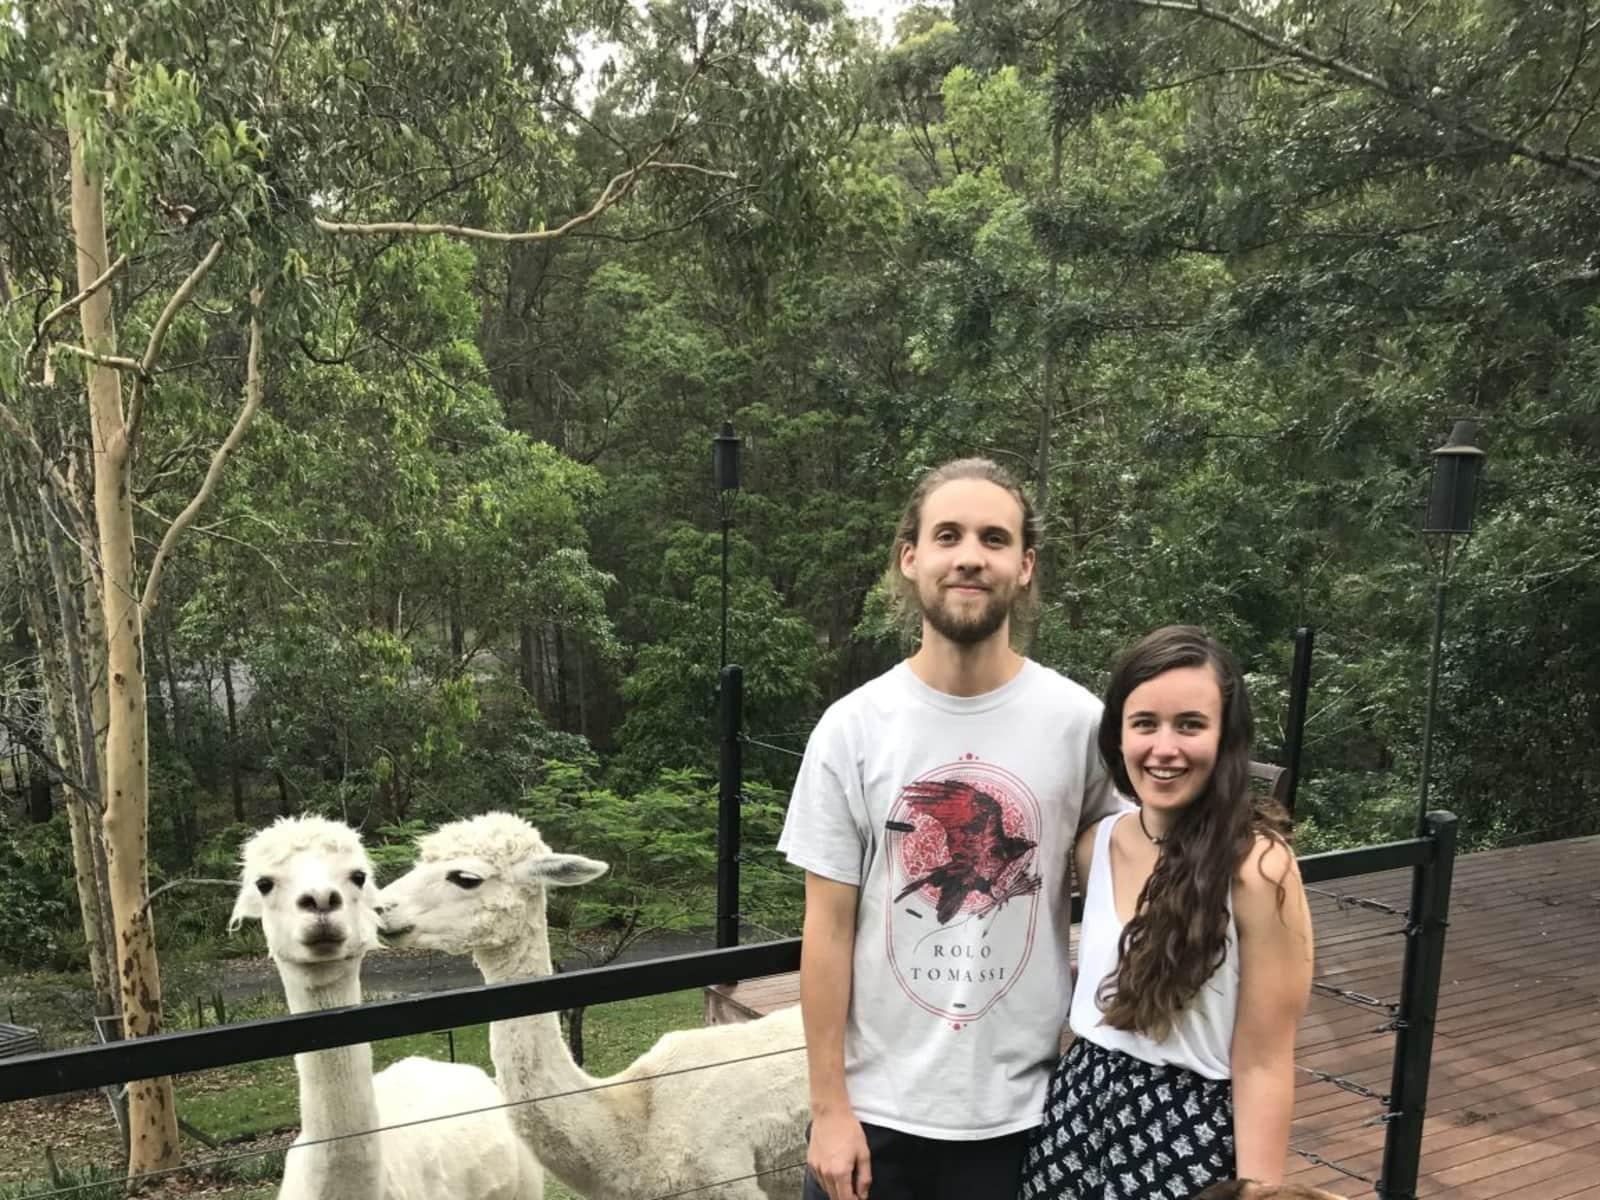 Hailey & Thomas from Geelong, Victoria, Australia